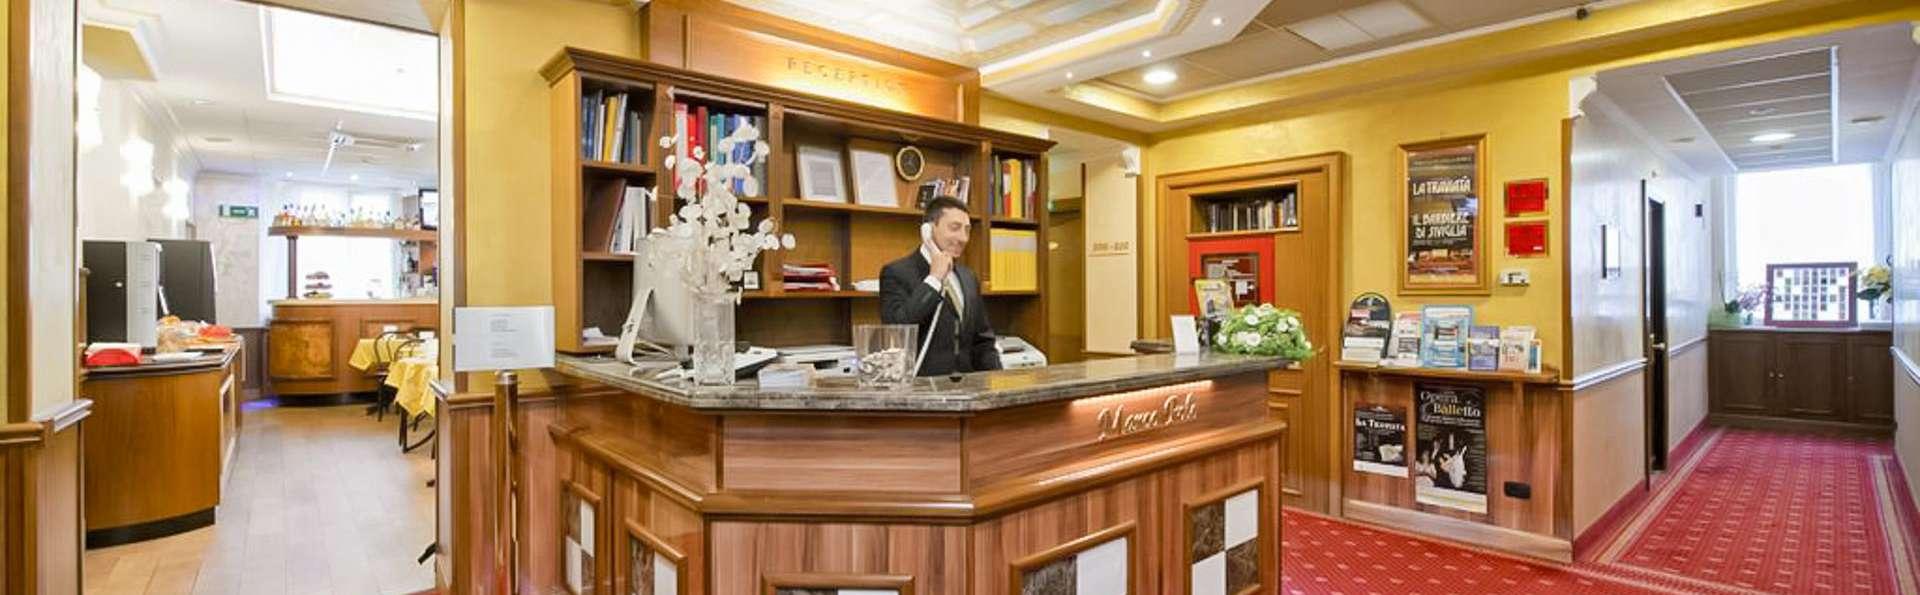 Hotel Marco Polo - EDIT_LOBBY_01.jpg